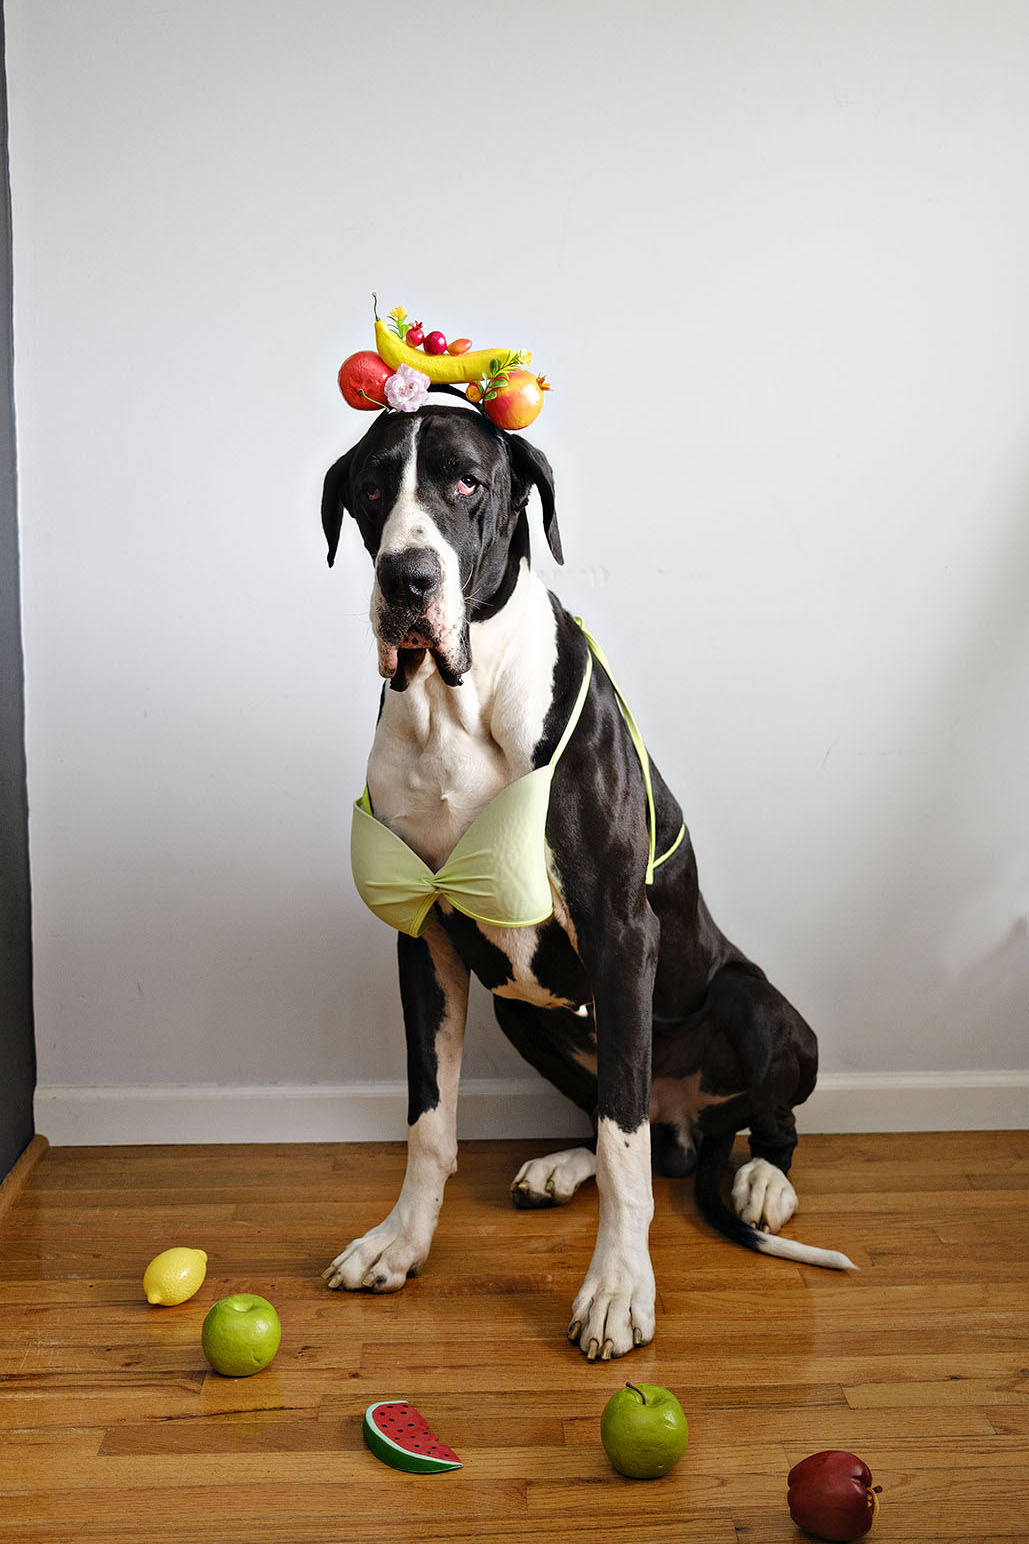 Funny dog photo of a great dane dressed in bikini